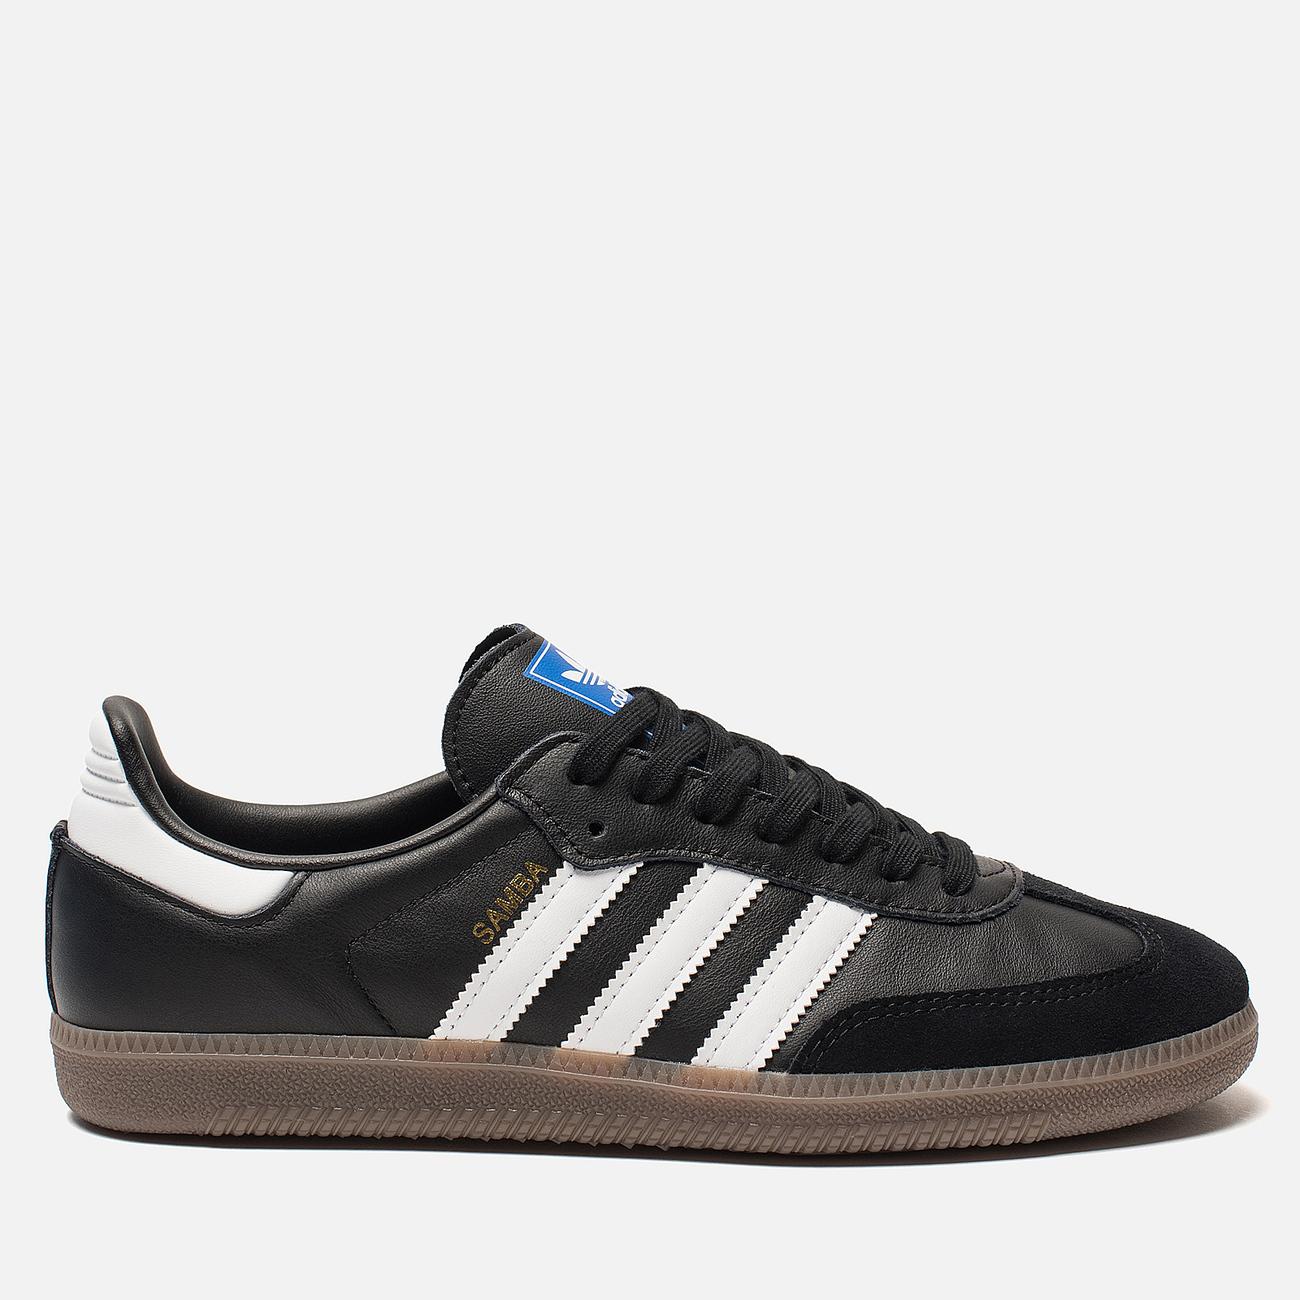 Мужские кроссовки adidas Originals Samba OG Core Black/White/Gum